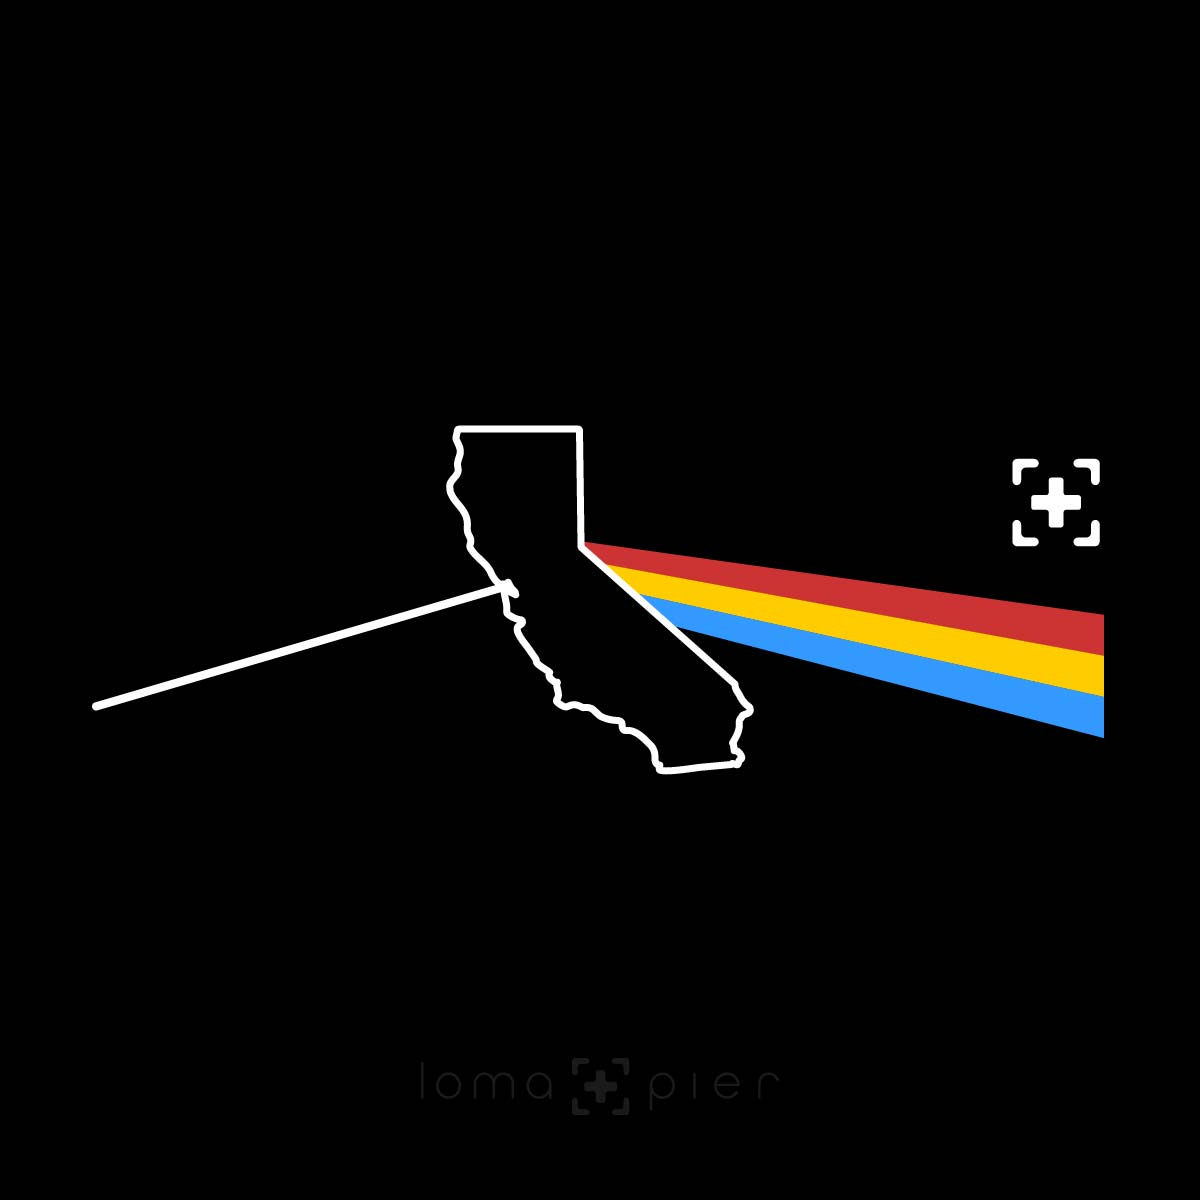 CALIFORNIA STATE PRISM album art design by loma+pier hat store